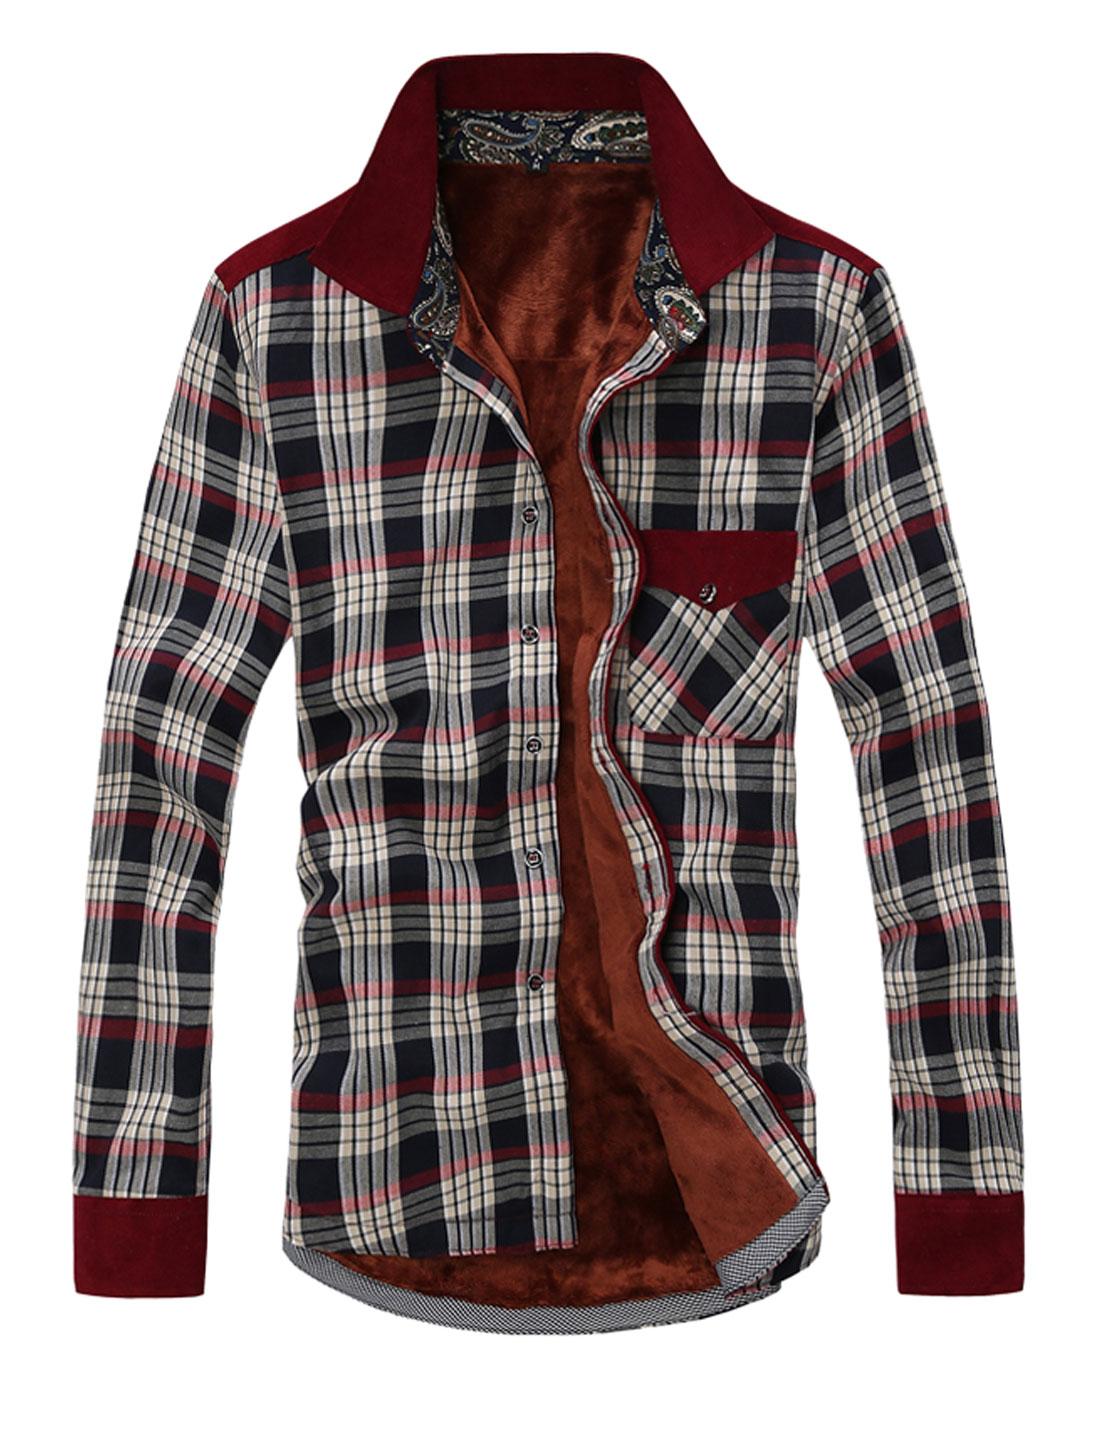 Men One Pocket Chest Fleece Lining Leisure Shirt Burgundy M